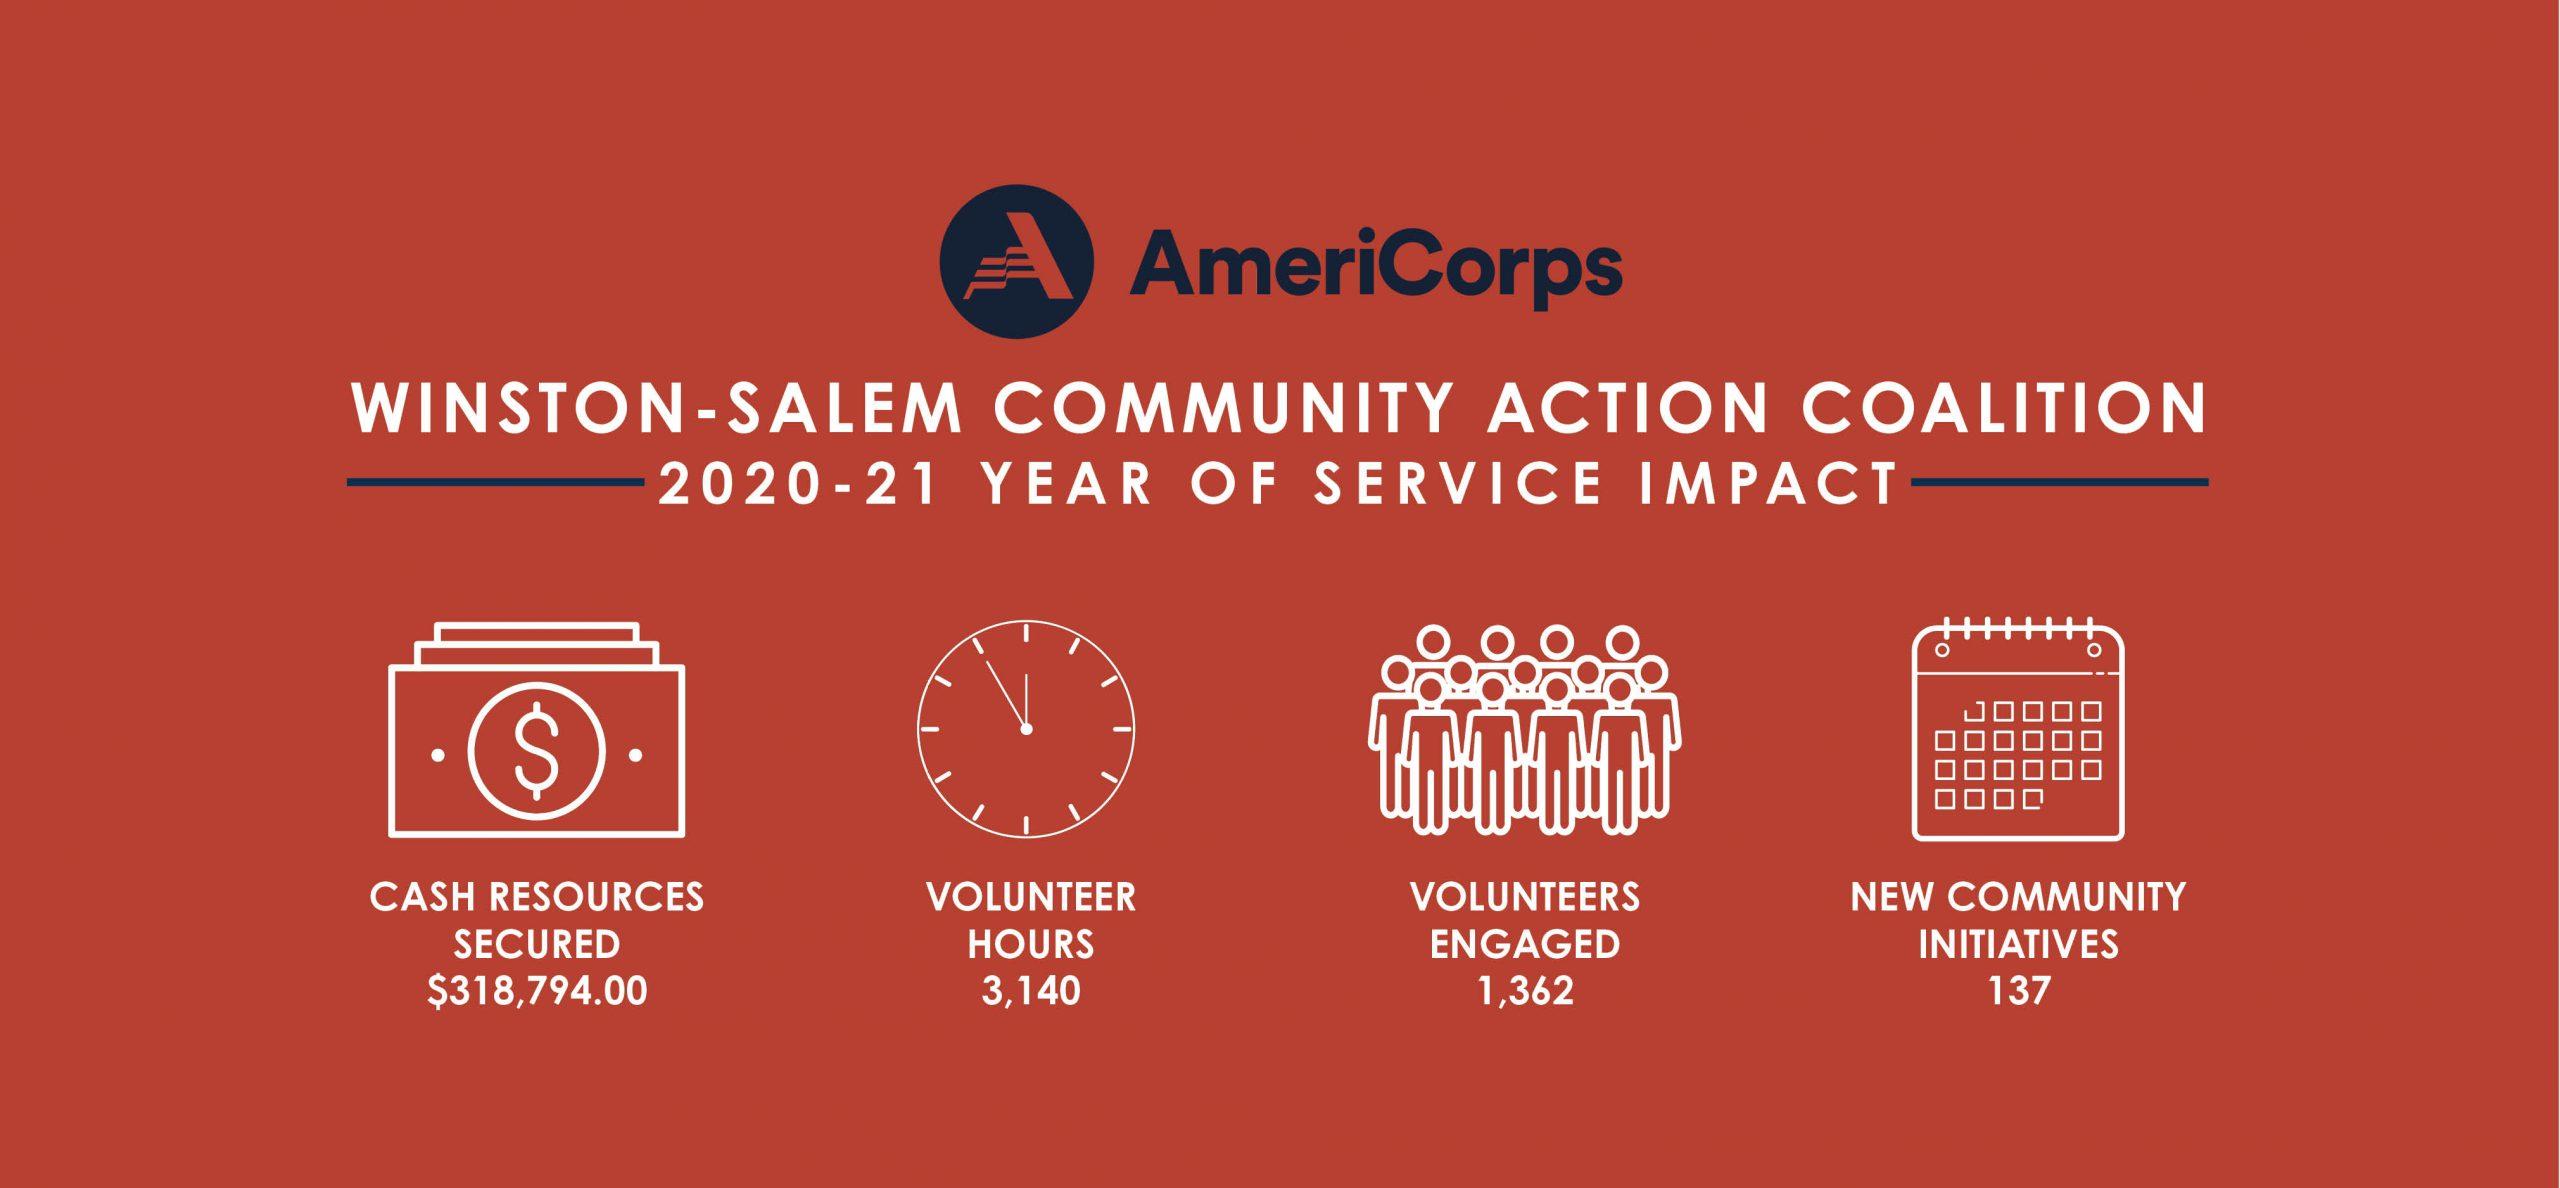 2020-21 Winston-Salem Community Action Coalition Impacts on the community.